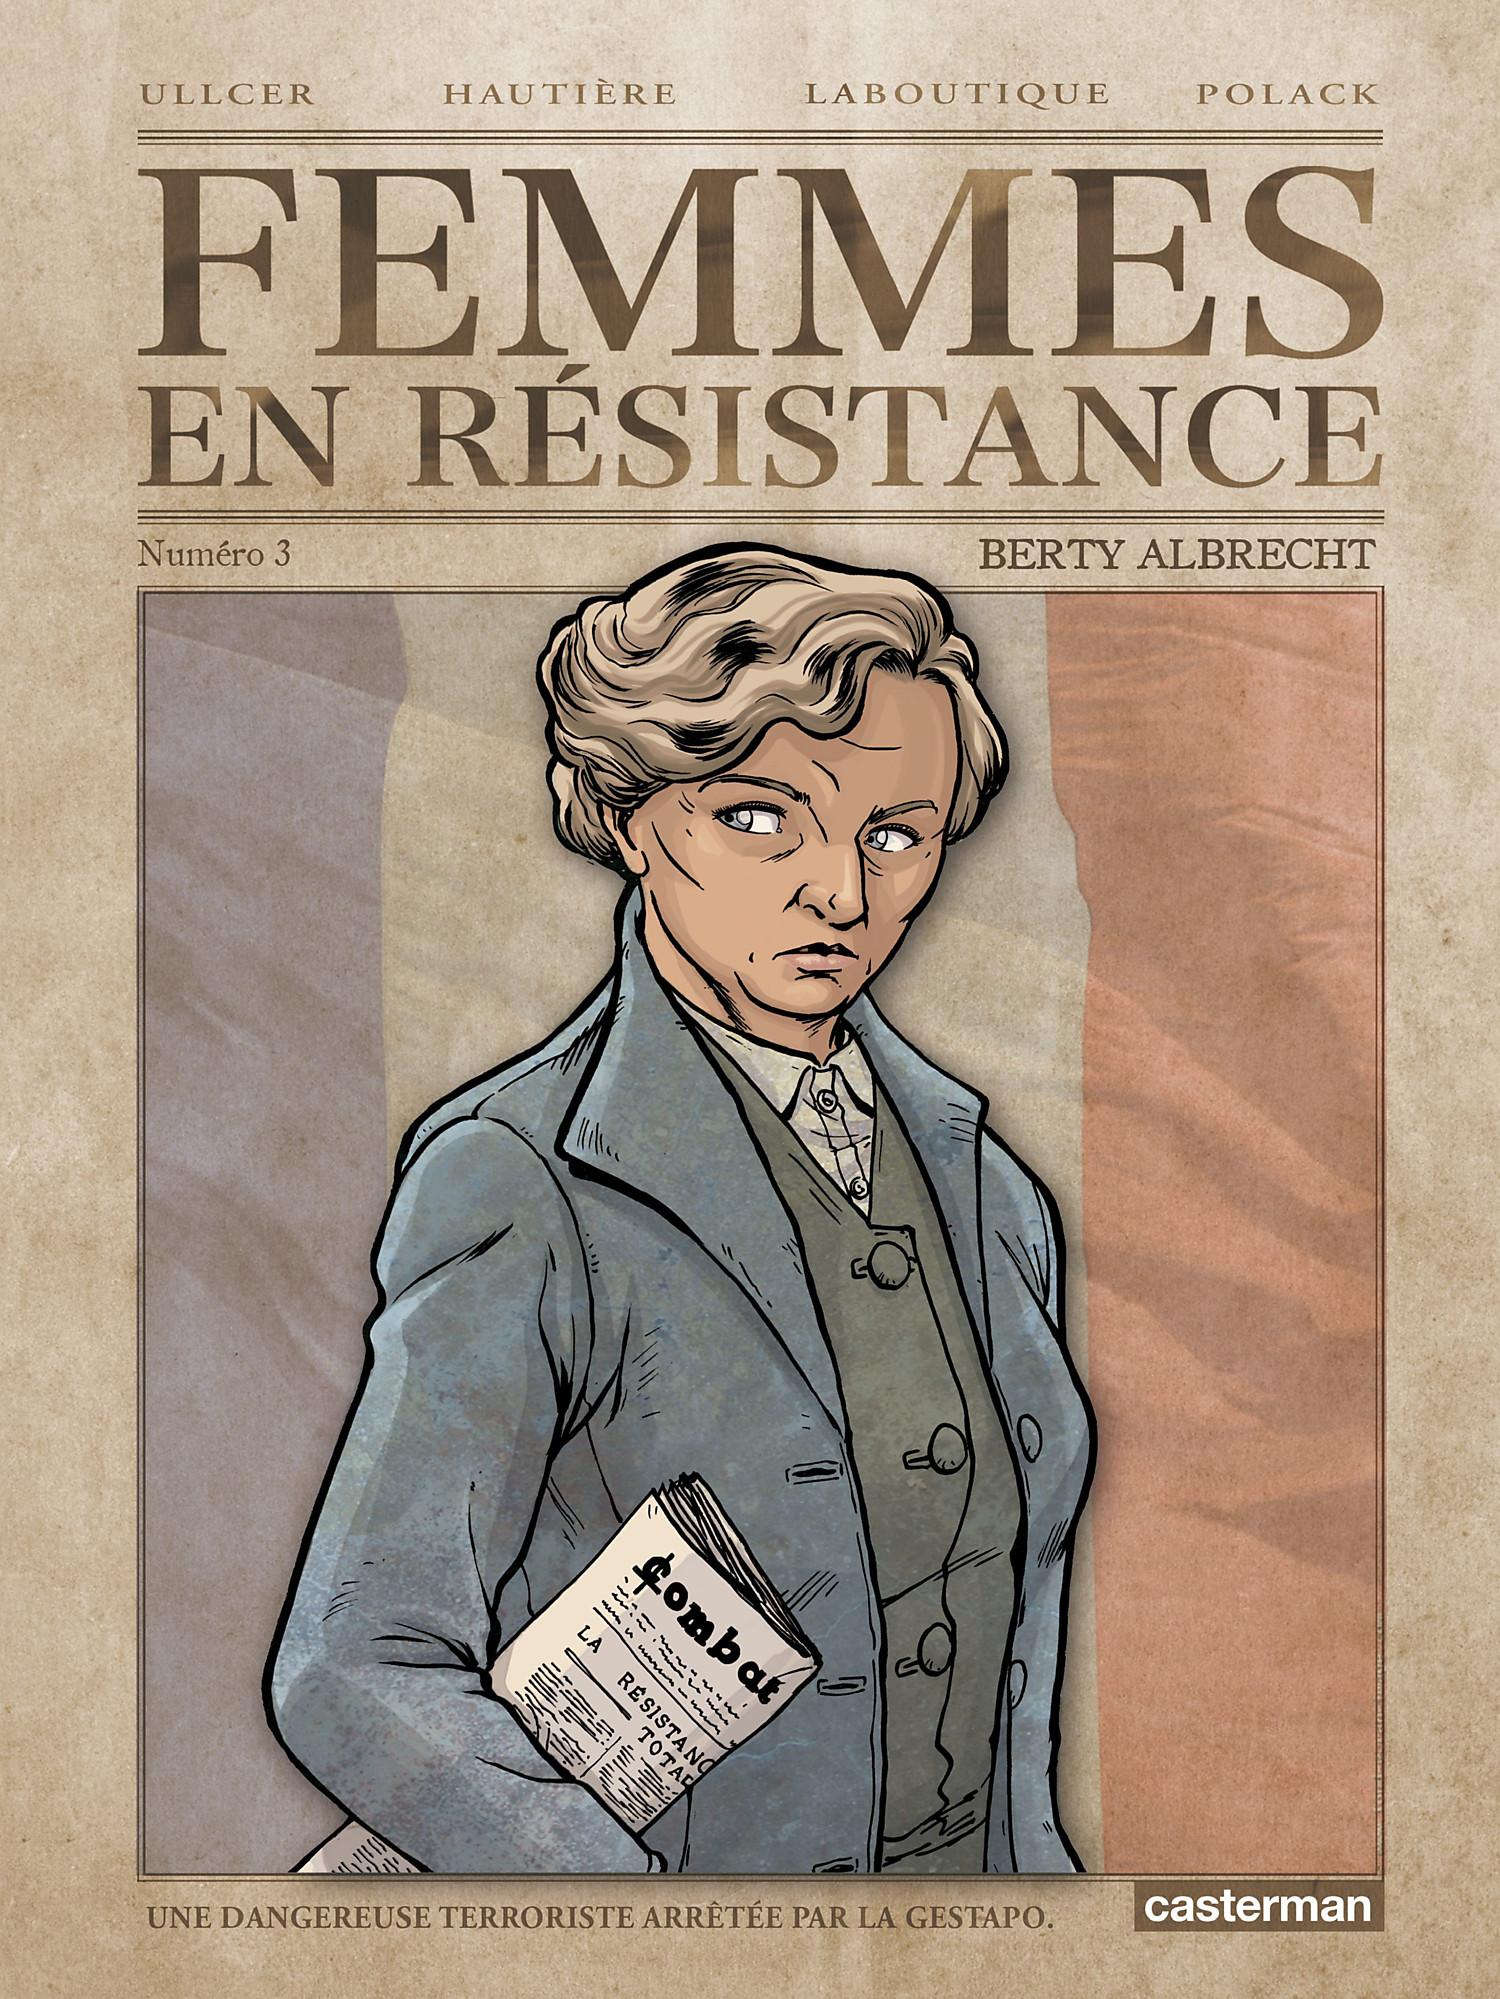 Femmes en résistance (Tome 3) - Berty Albrecht